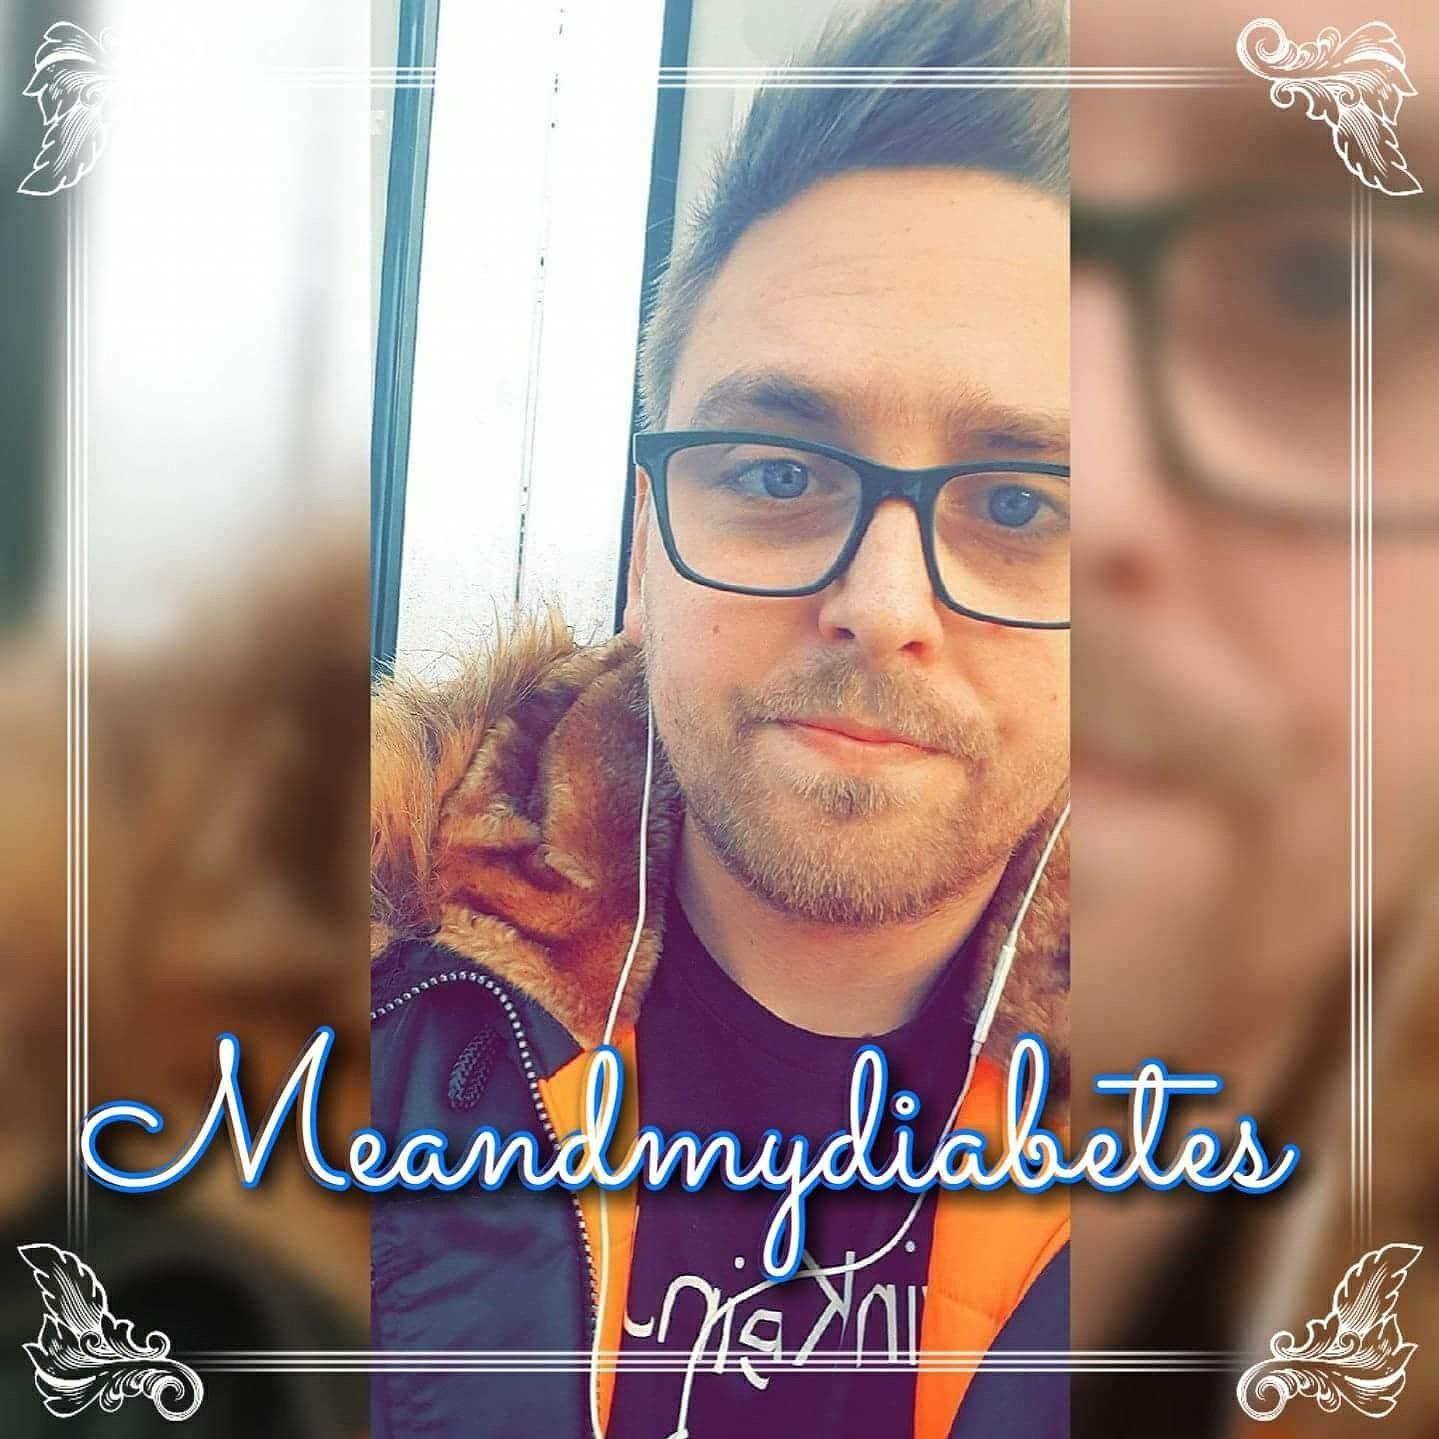 meandmydiabetes